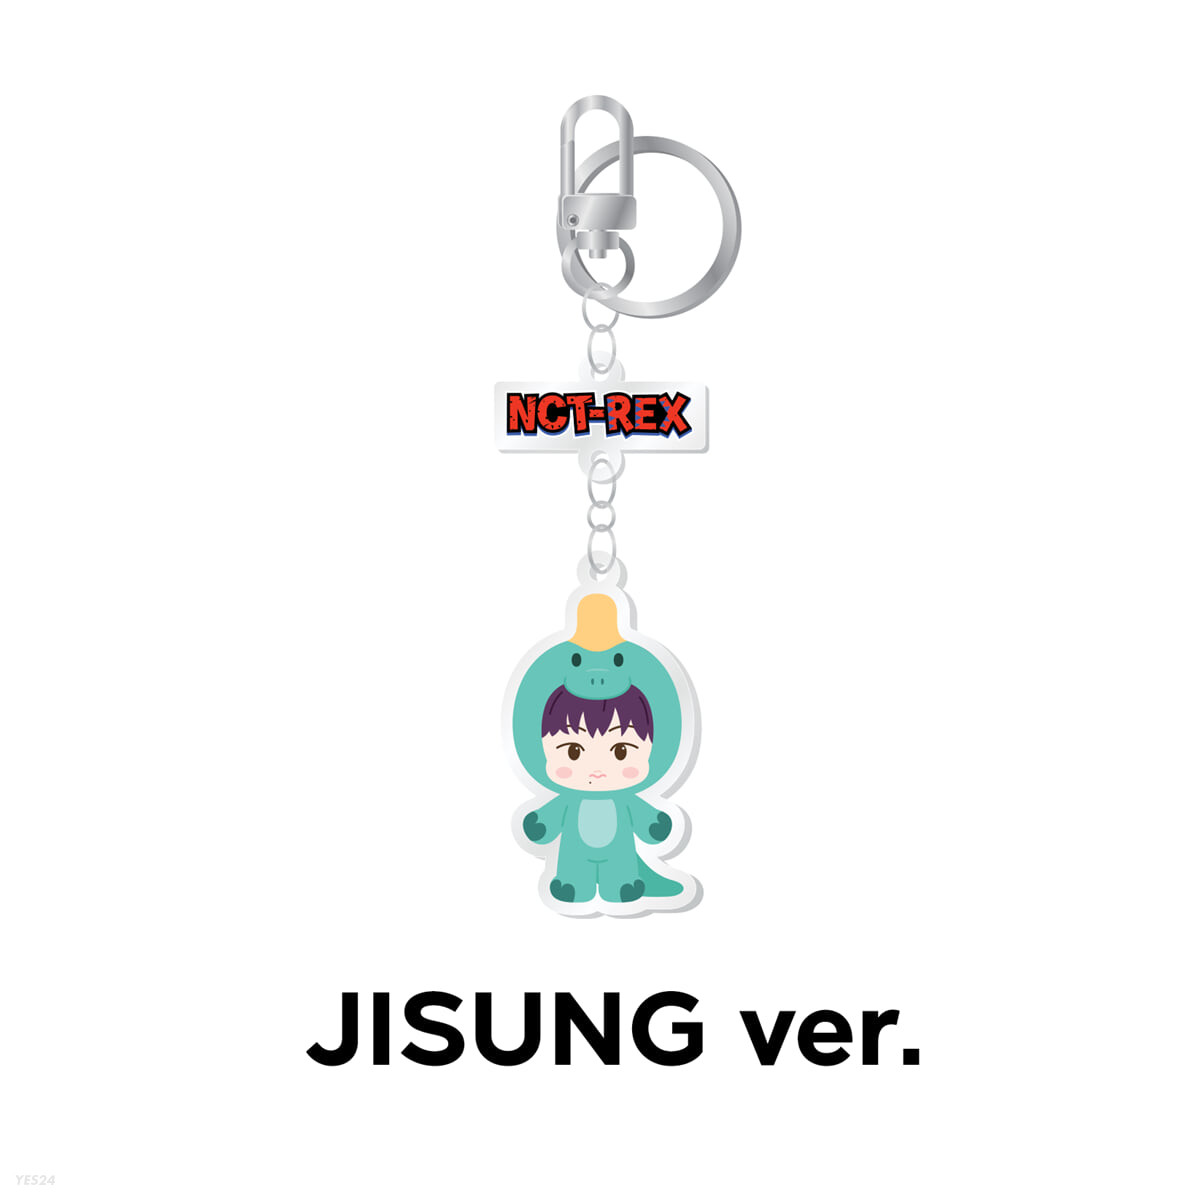 [JISUNG] ACRYLIC KEY RING - NCT DREAM X PINKFONG